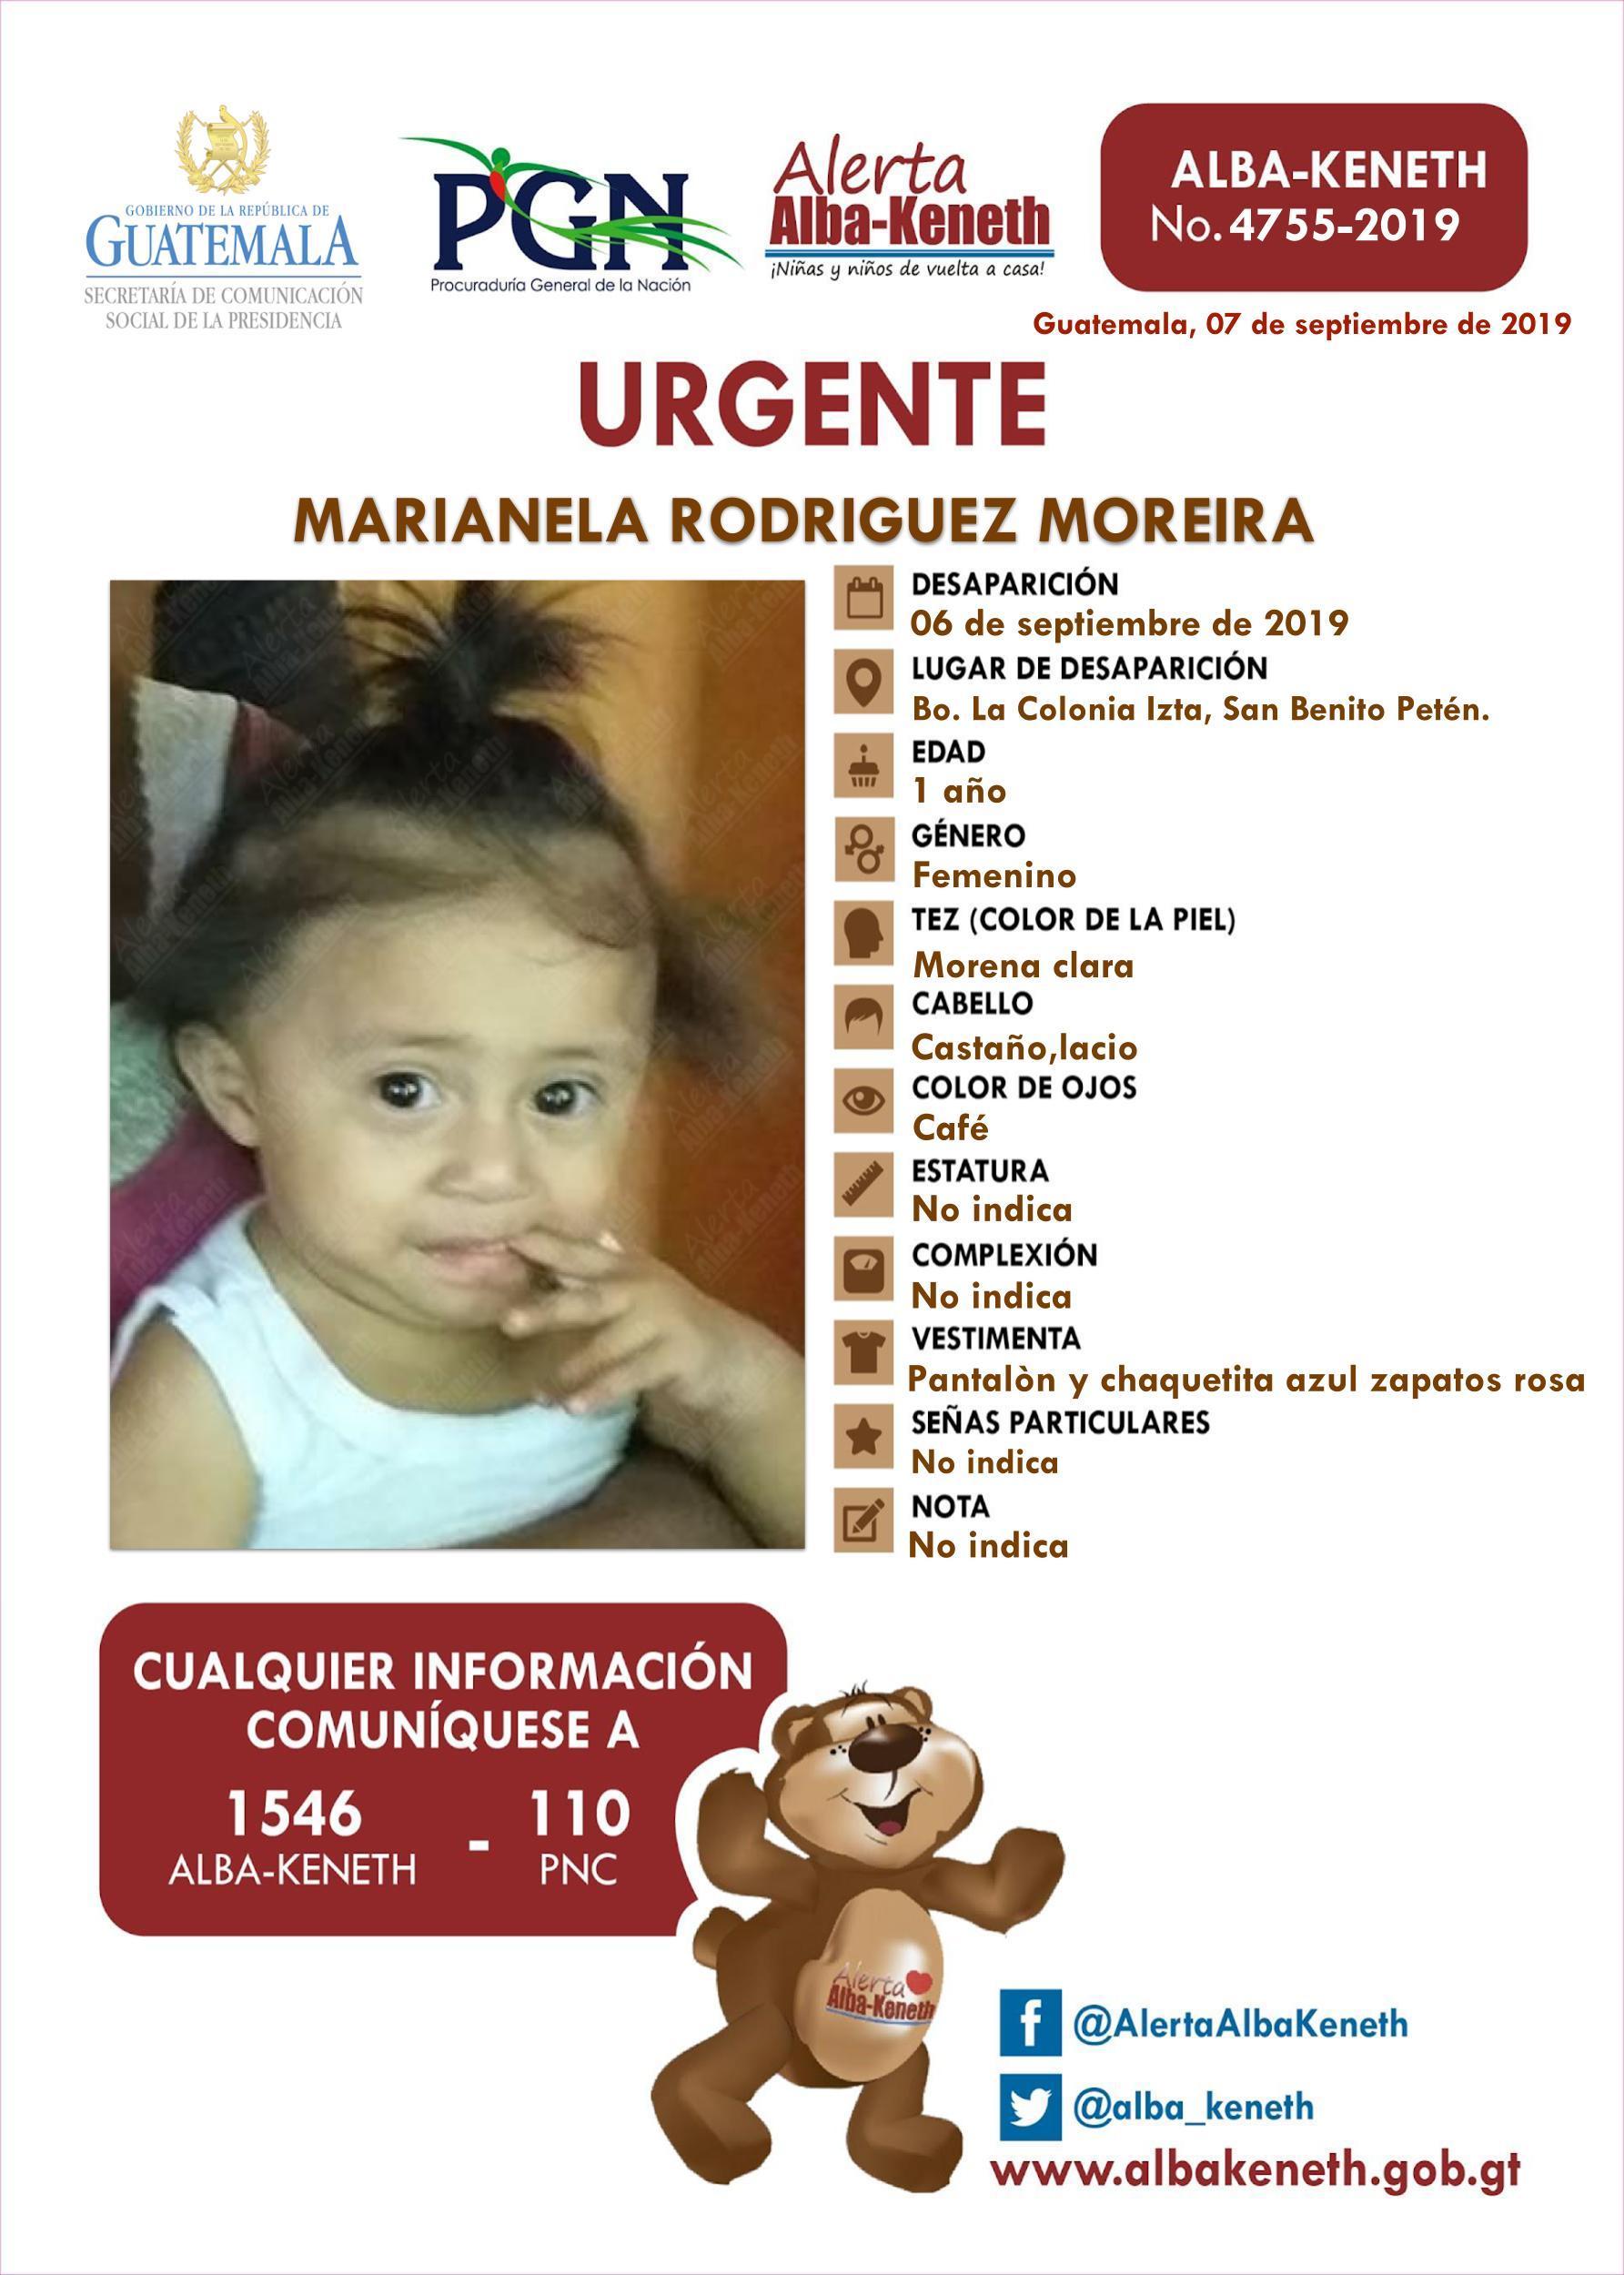 Marianela Rodriguez Moreira